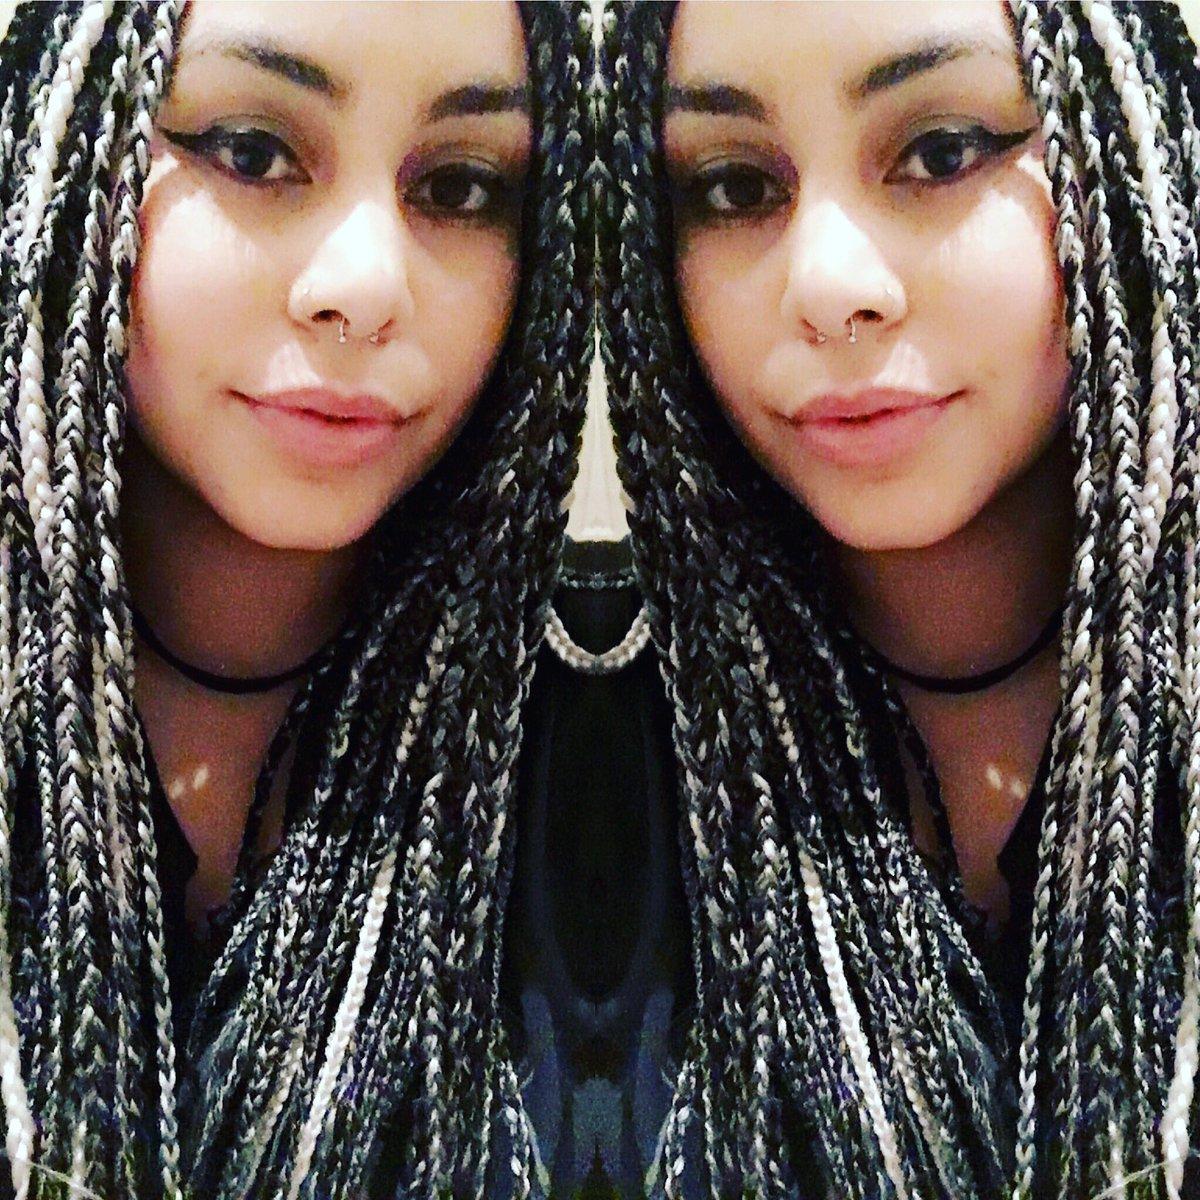 Hayley Pickering On Twitter Boxbraids Braids Protectivestyles Mixedrace Mua Makeup Wingedliner